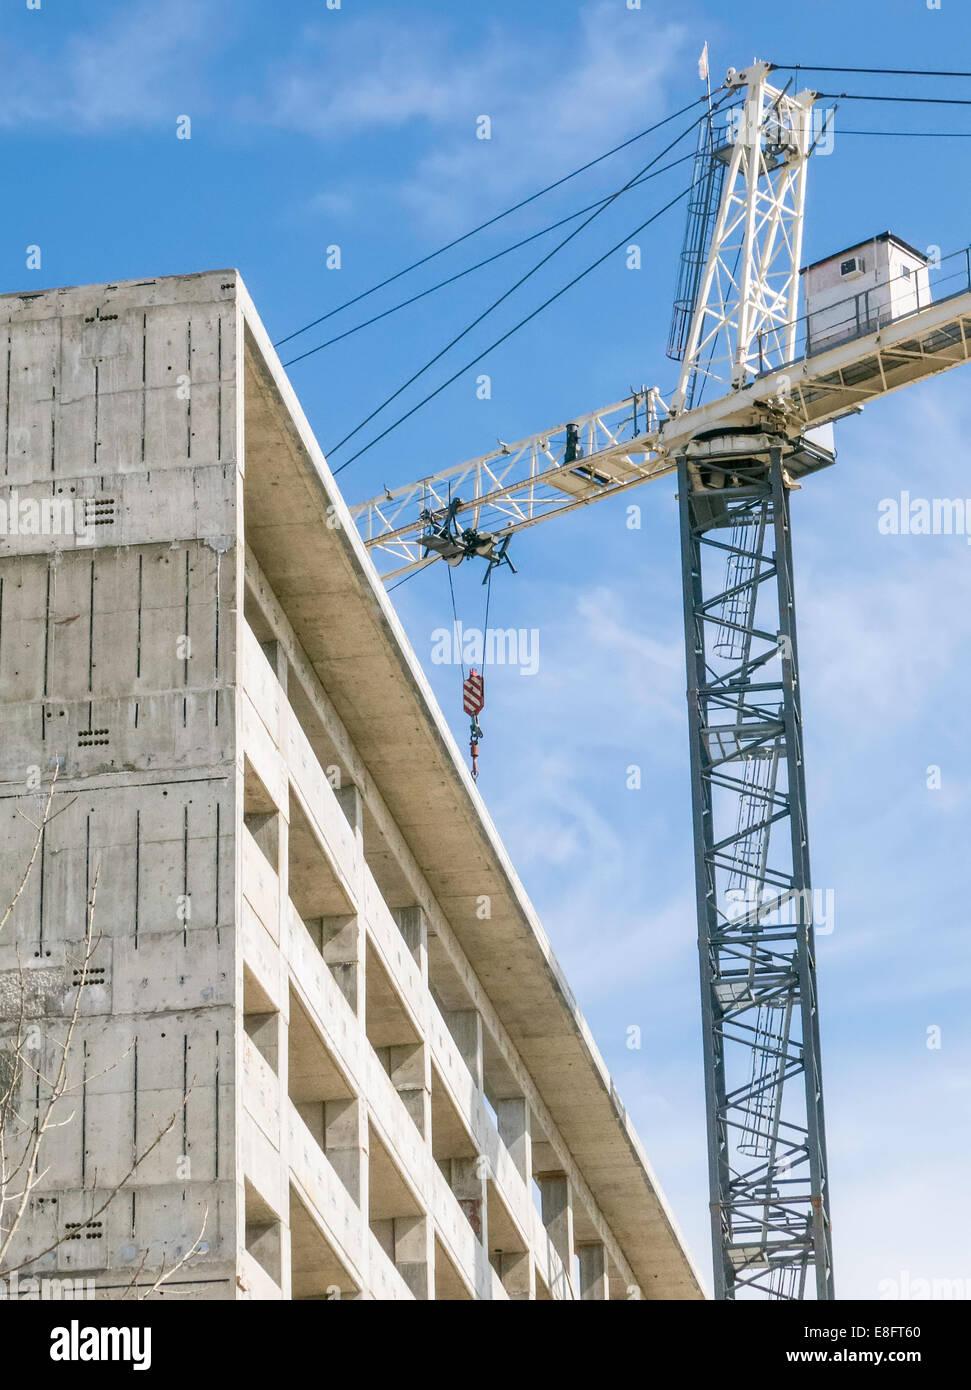 USA, Illinois, Construction site - Stock Image